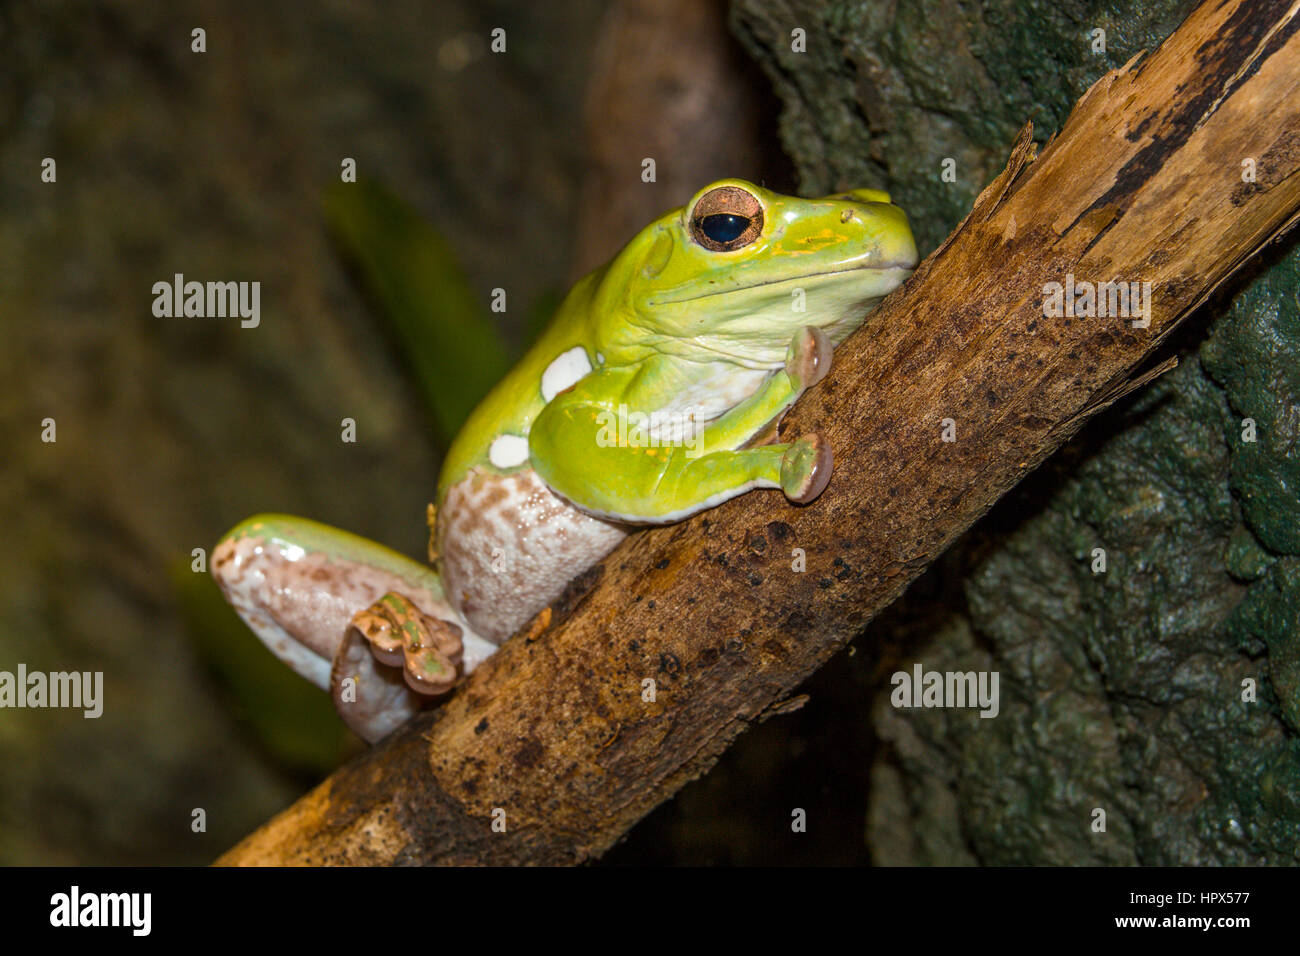 Closeup of Mexican Dumpy Frog - Stock Image